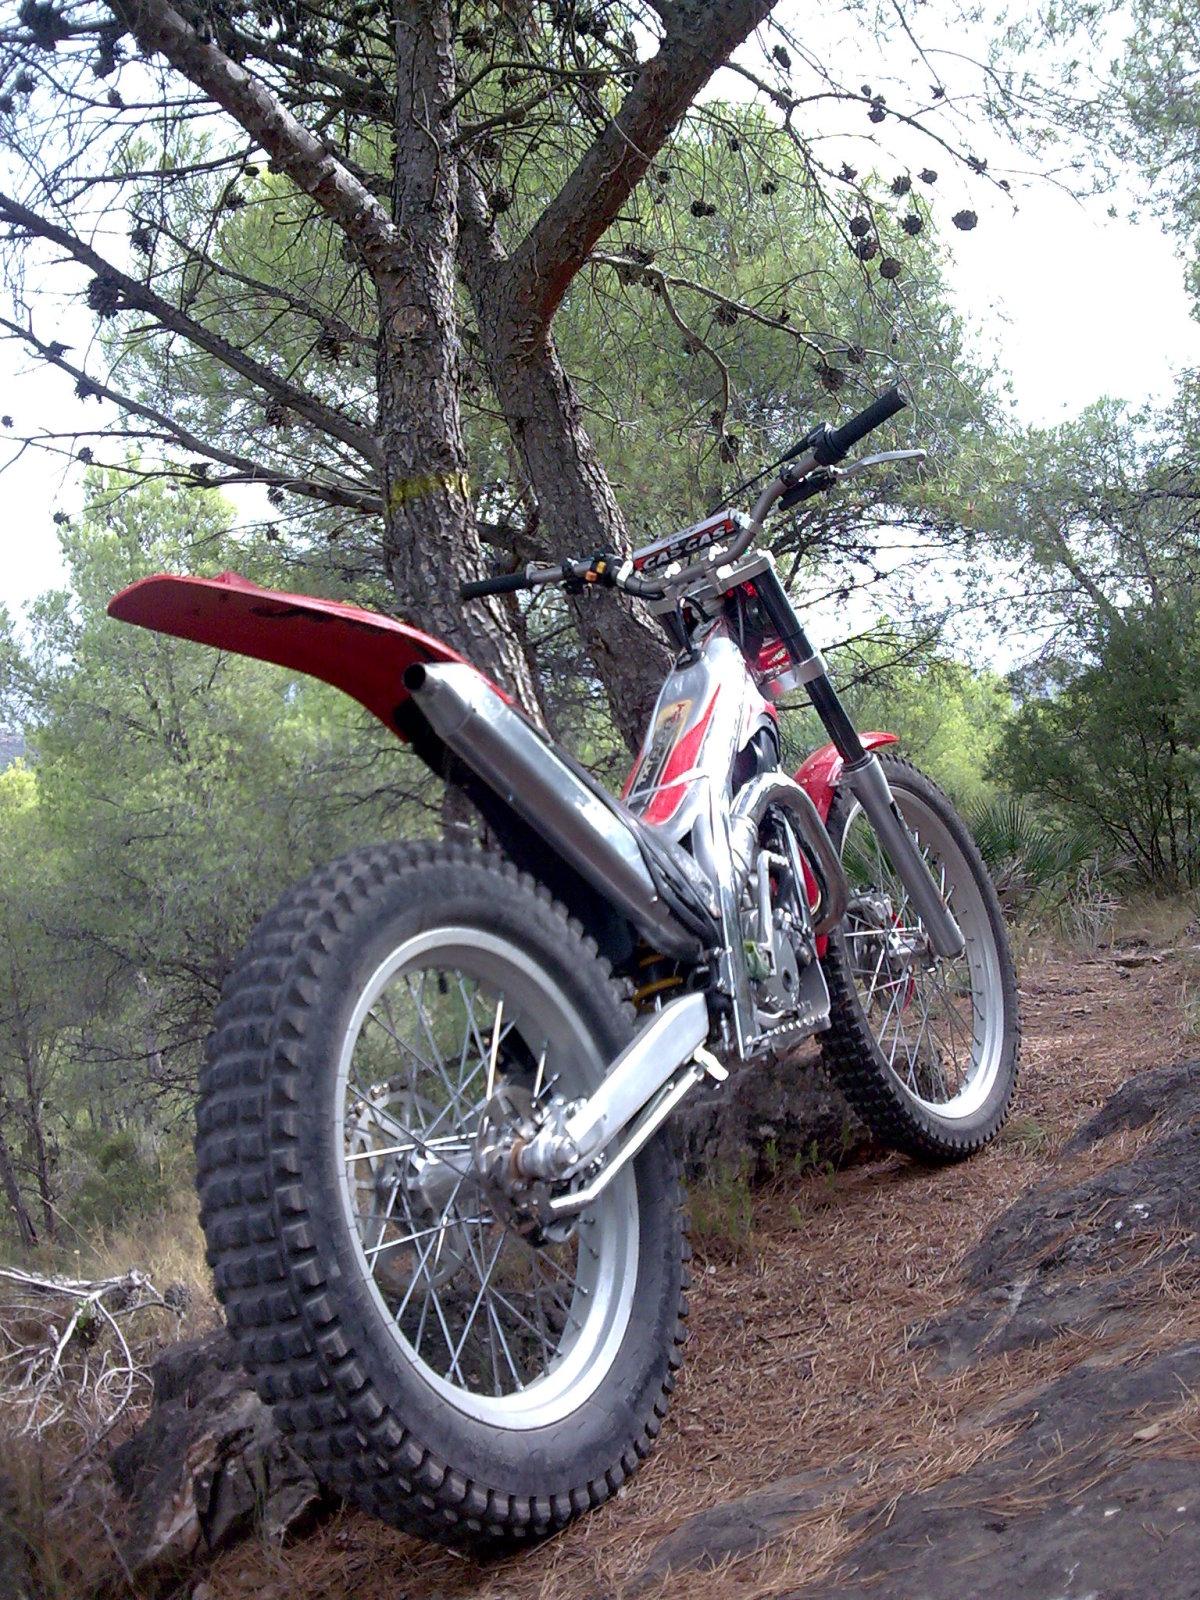 Tu moto moderna o de uso habitual - Página 11 2gybya9